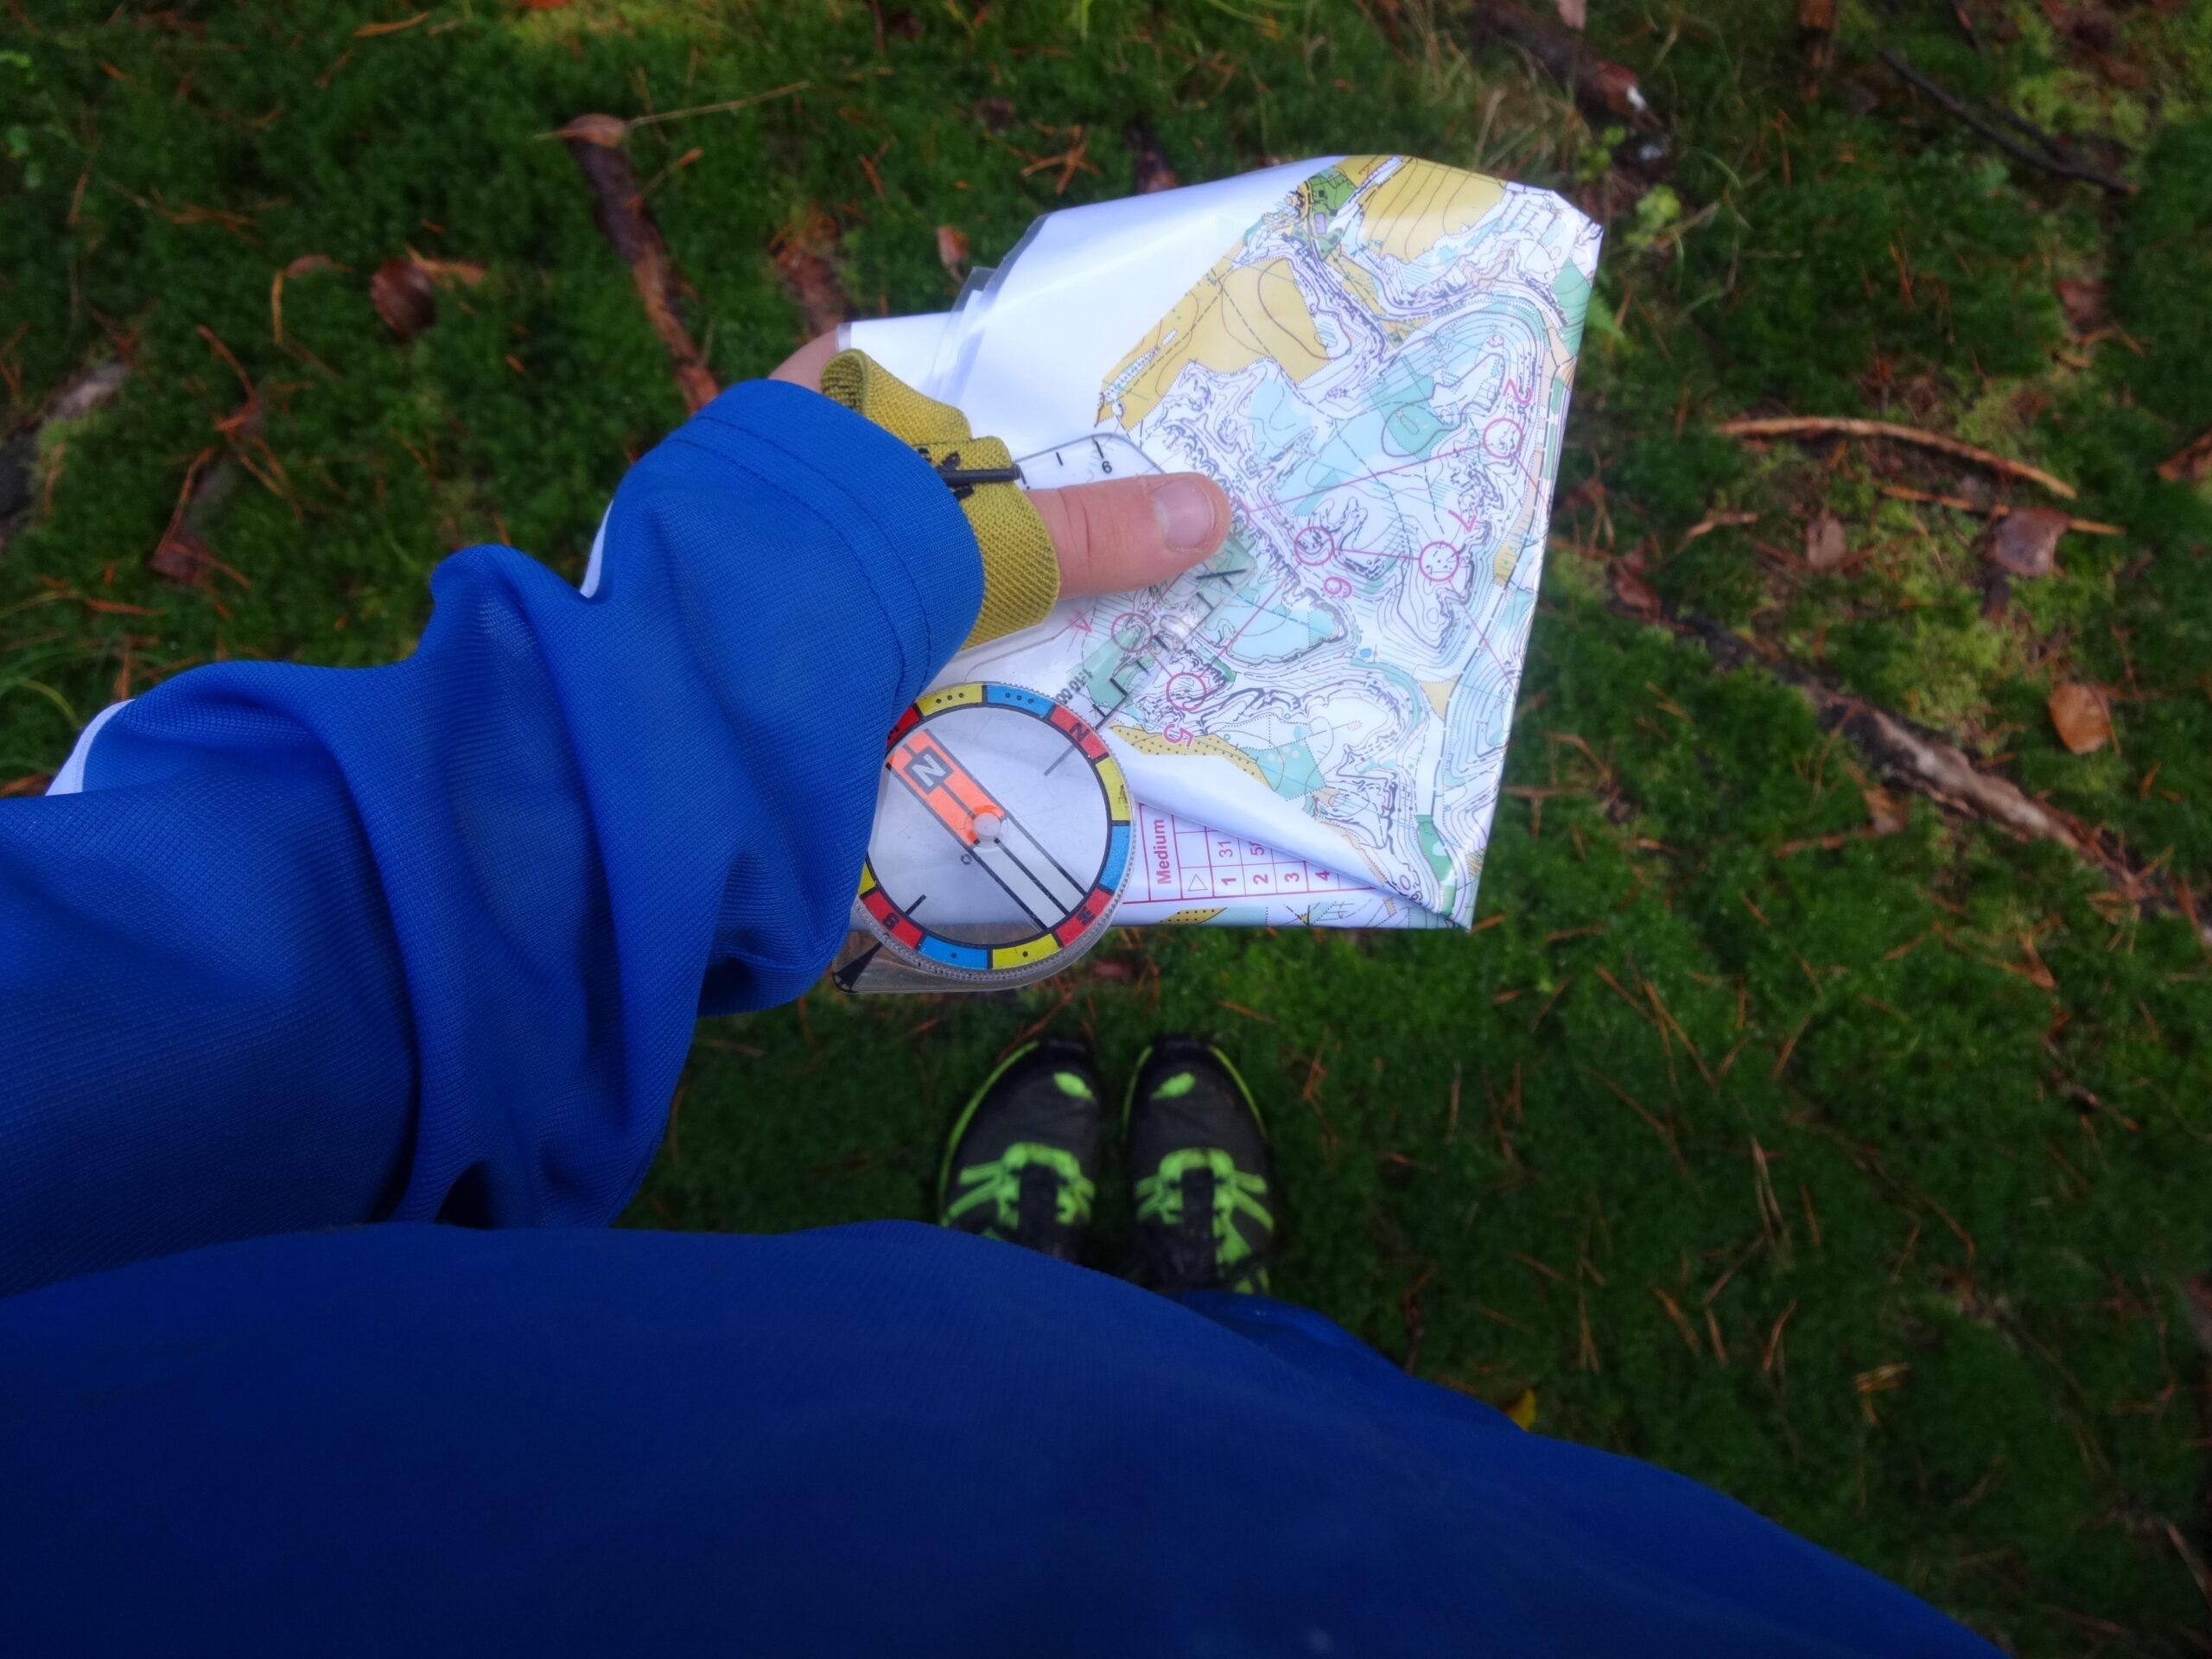 Kort og kompas prøv orienteringsløb